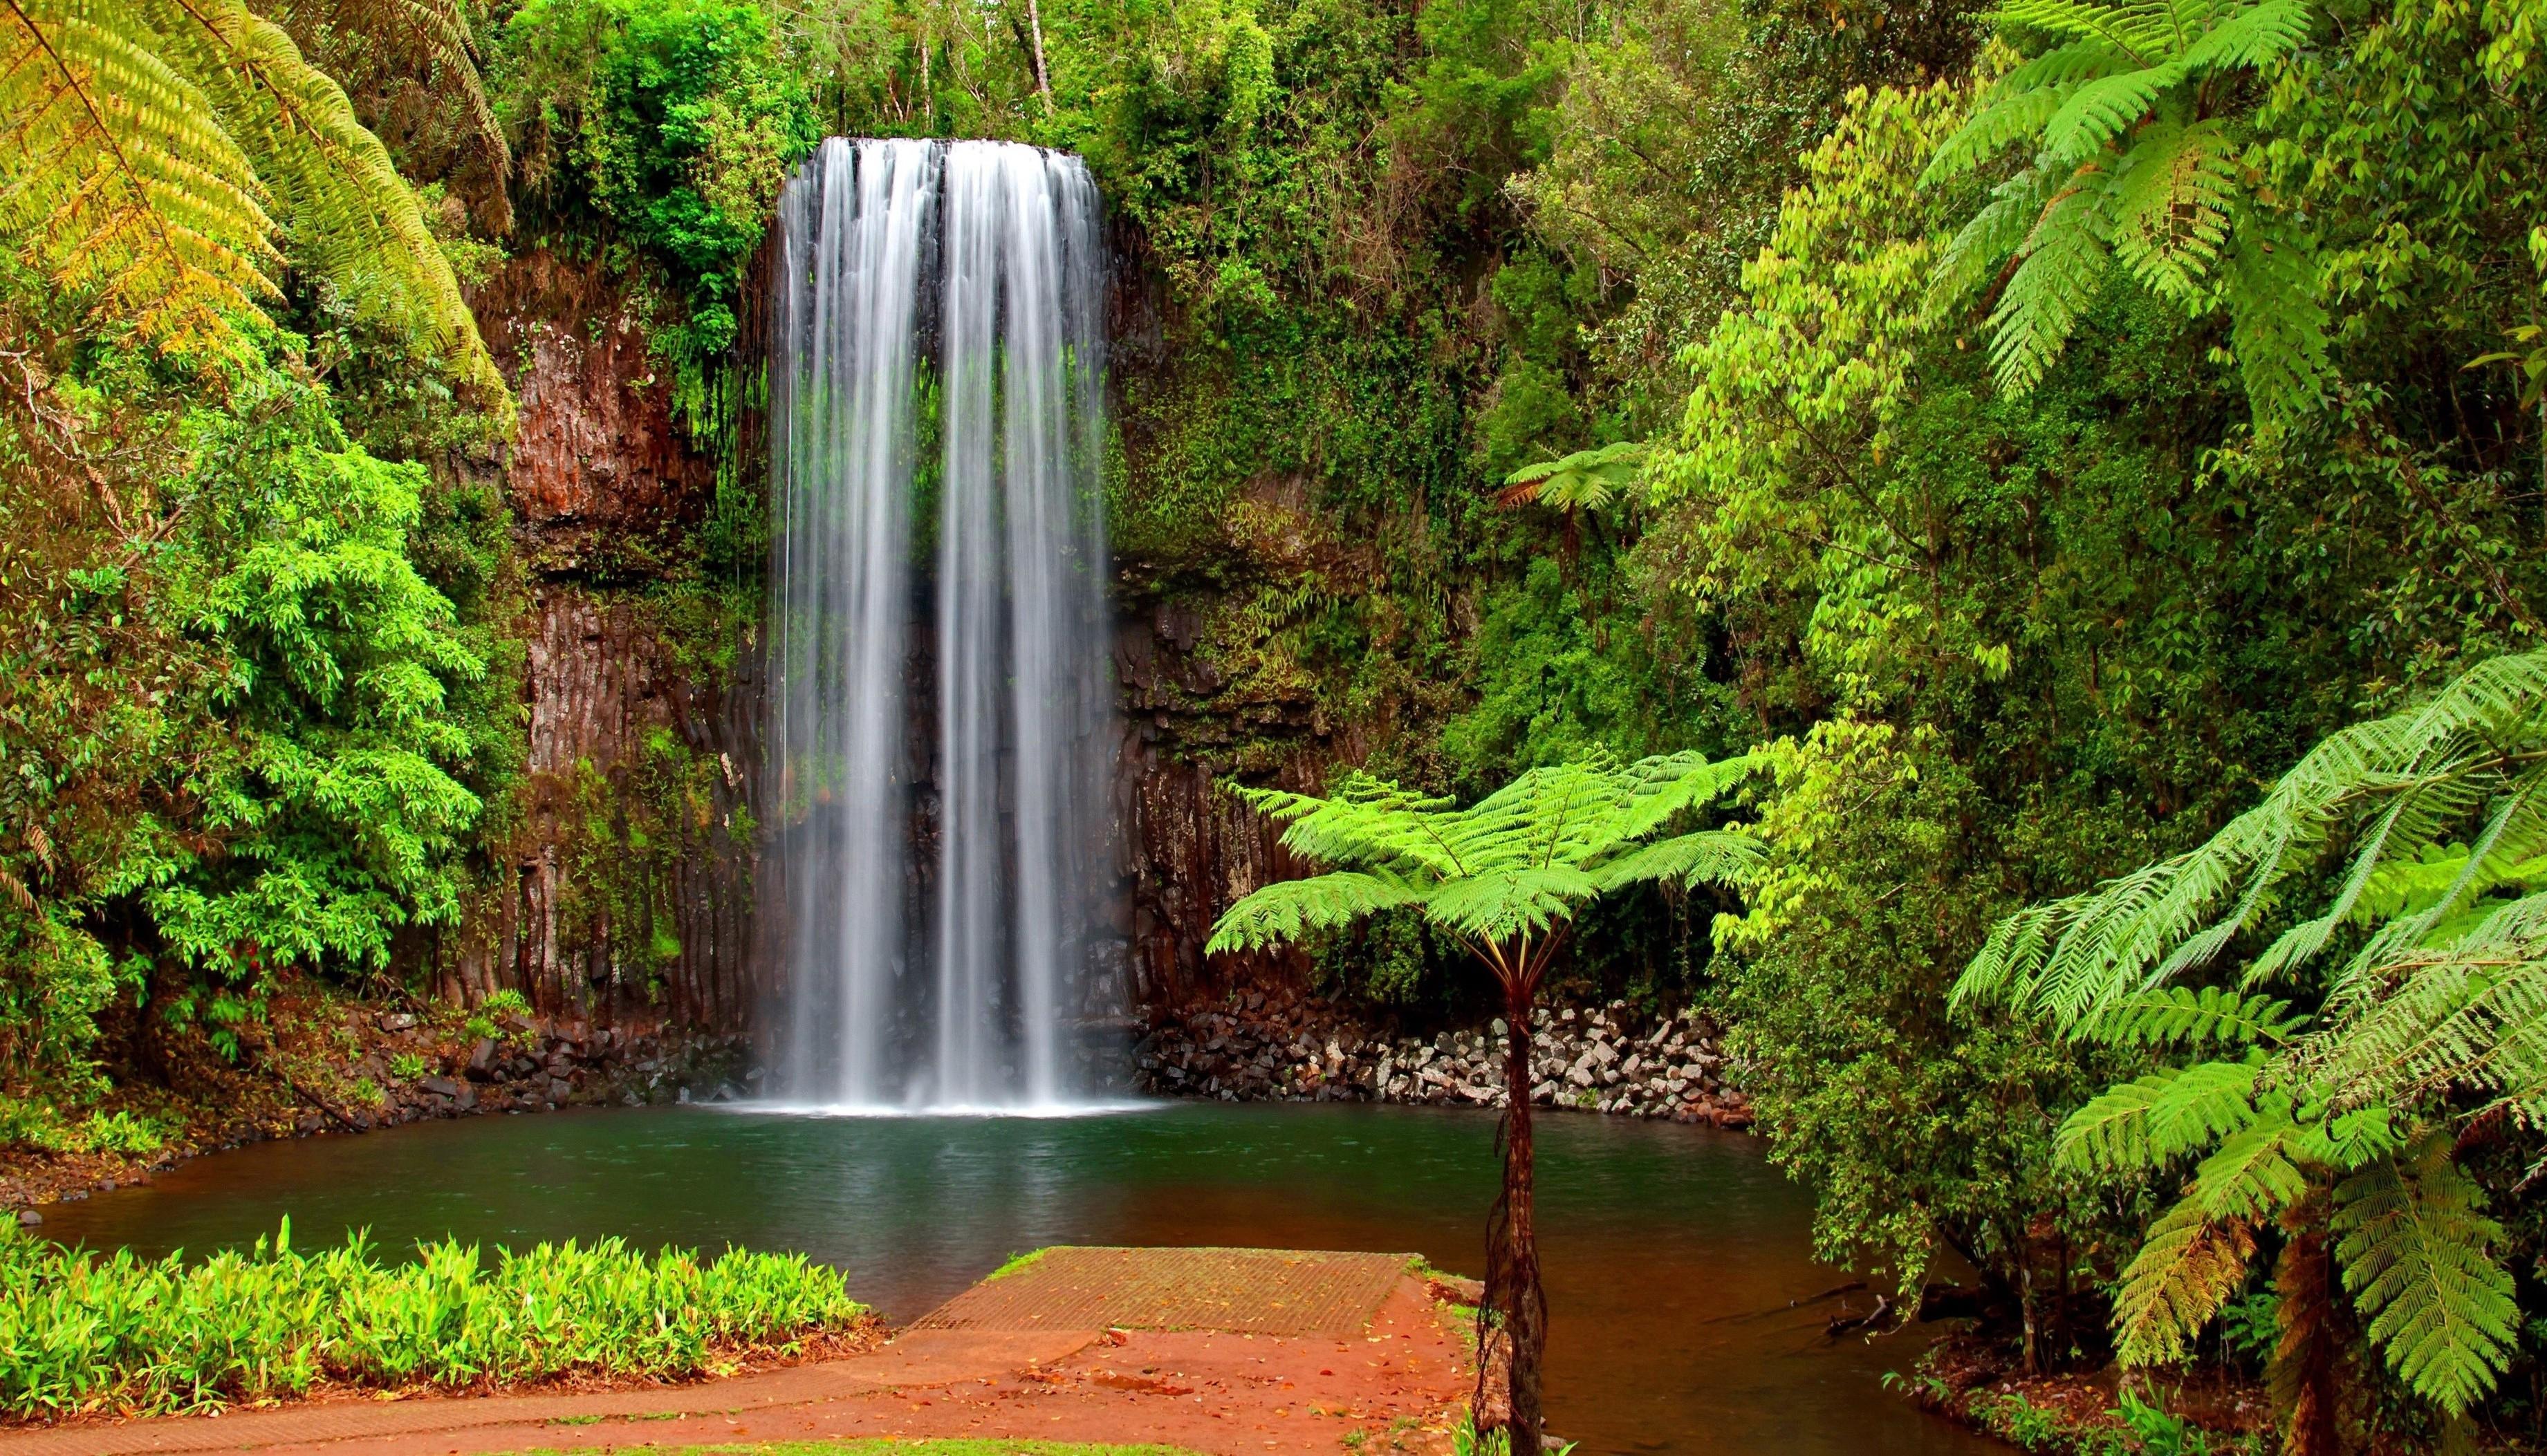 Fondos de pantalla paisaje bosque cascada verde - Cascada de jardin ...